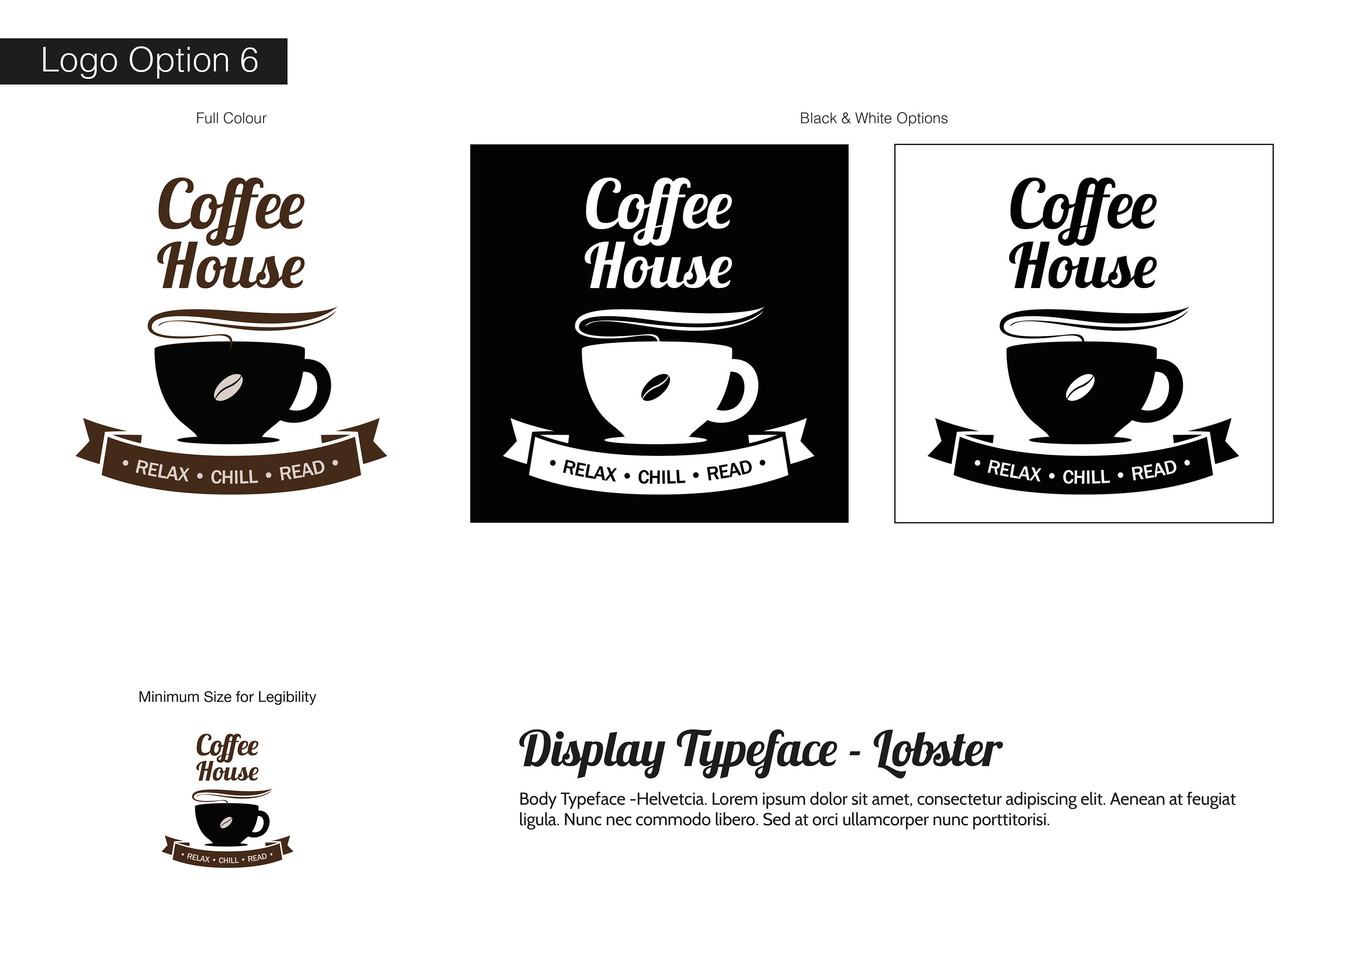 Coffee House Visual Identity - Development 6